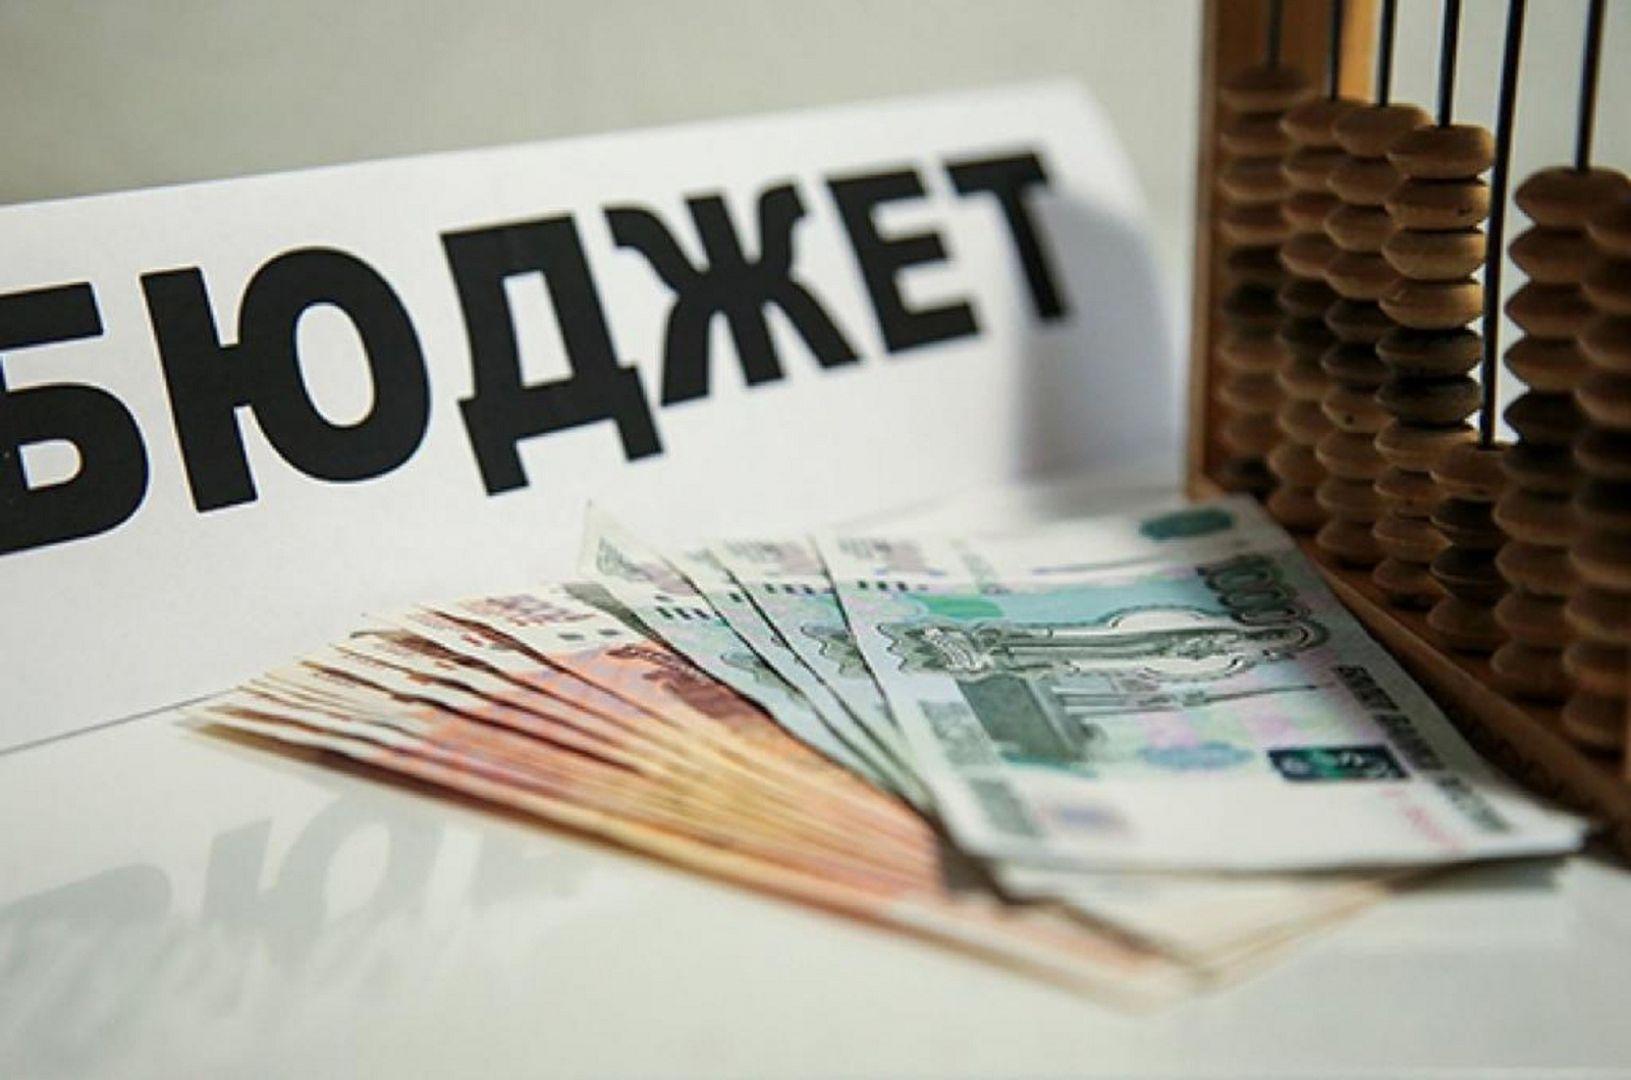 Расходы бюджета Дона на 2021 год увеличили на 26 млрд руб.